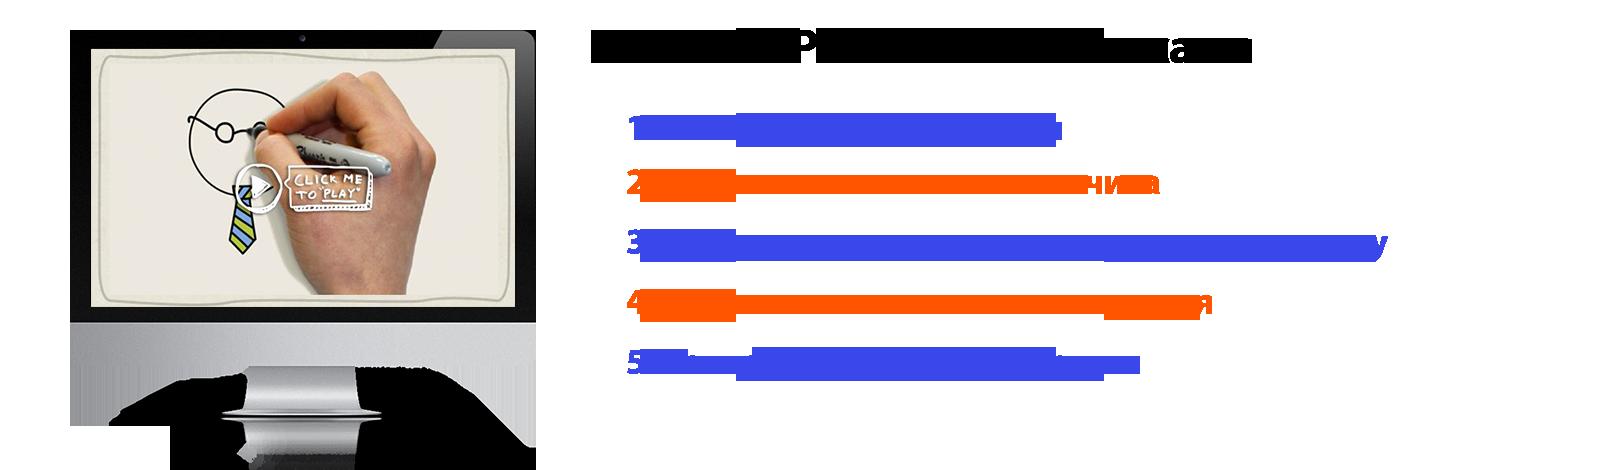 Blok_7_video